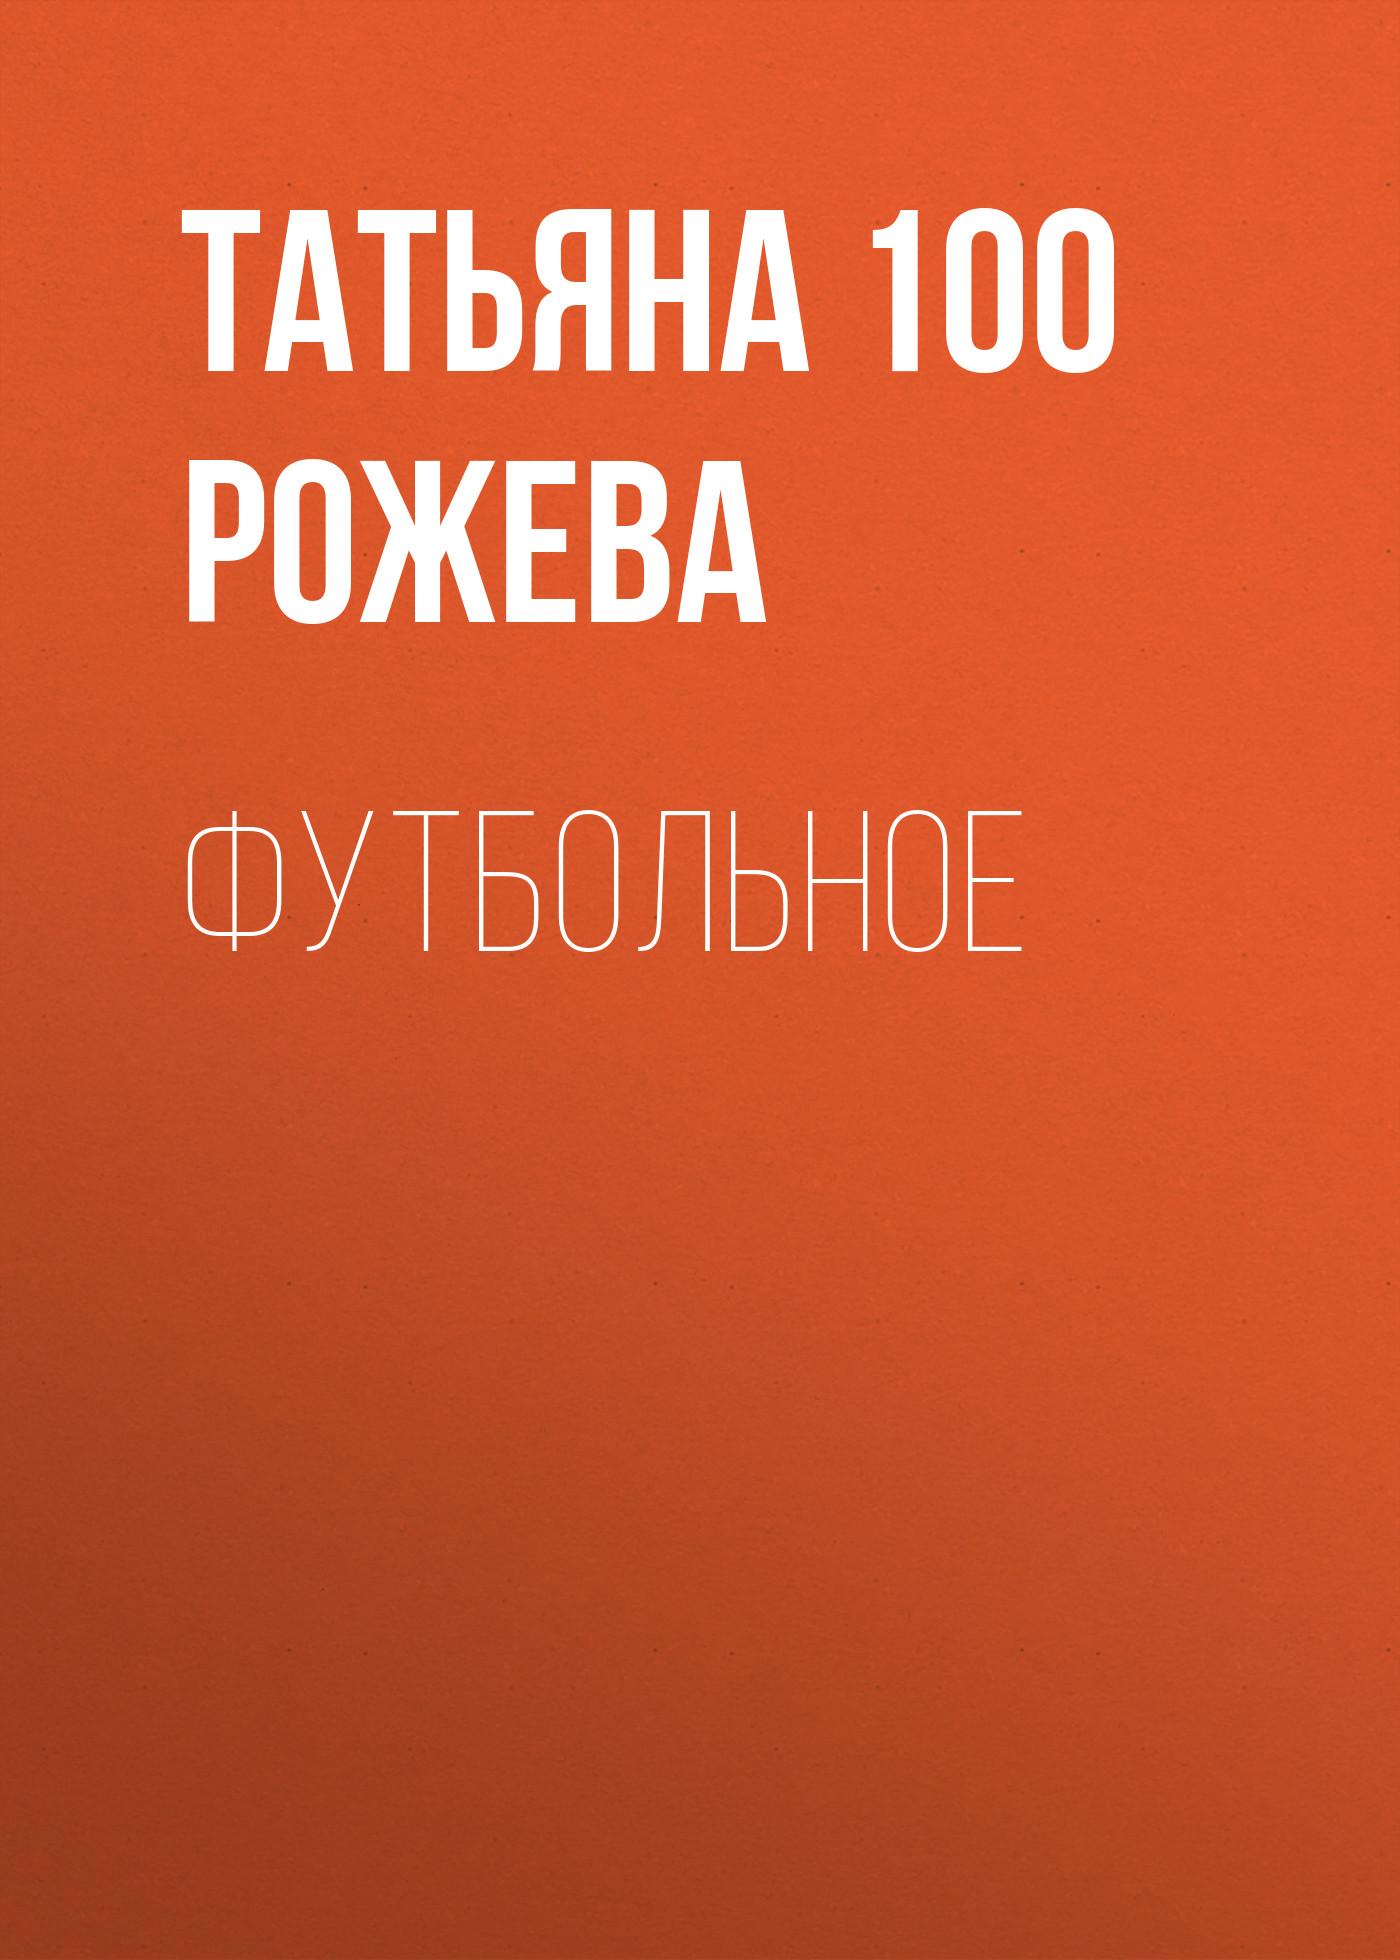 Татьяна 100 Рожева Футбольное цена 2017